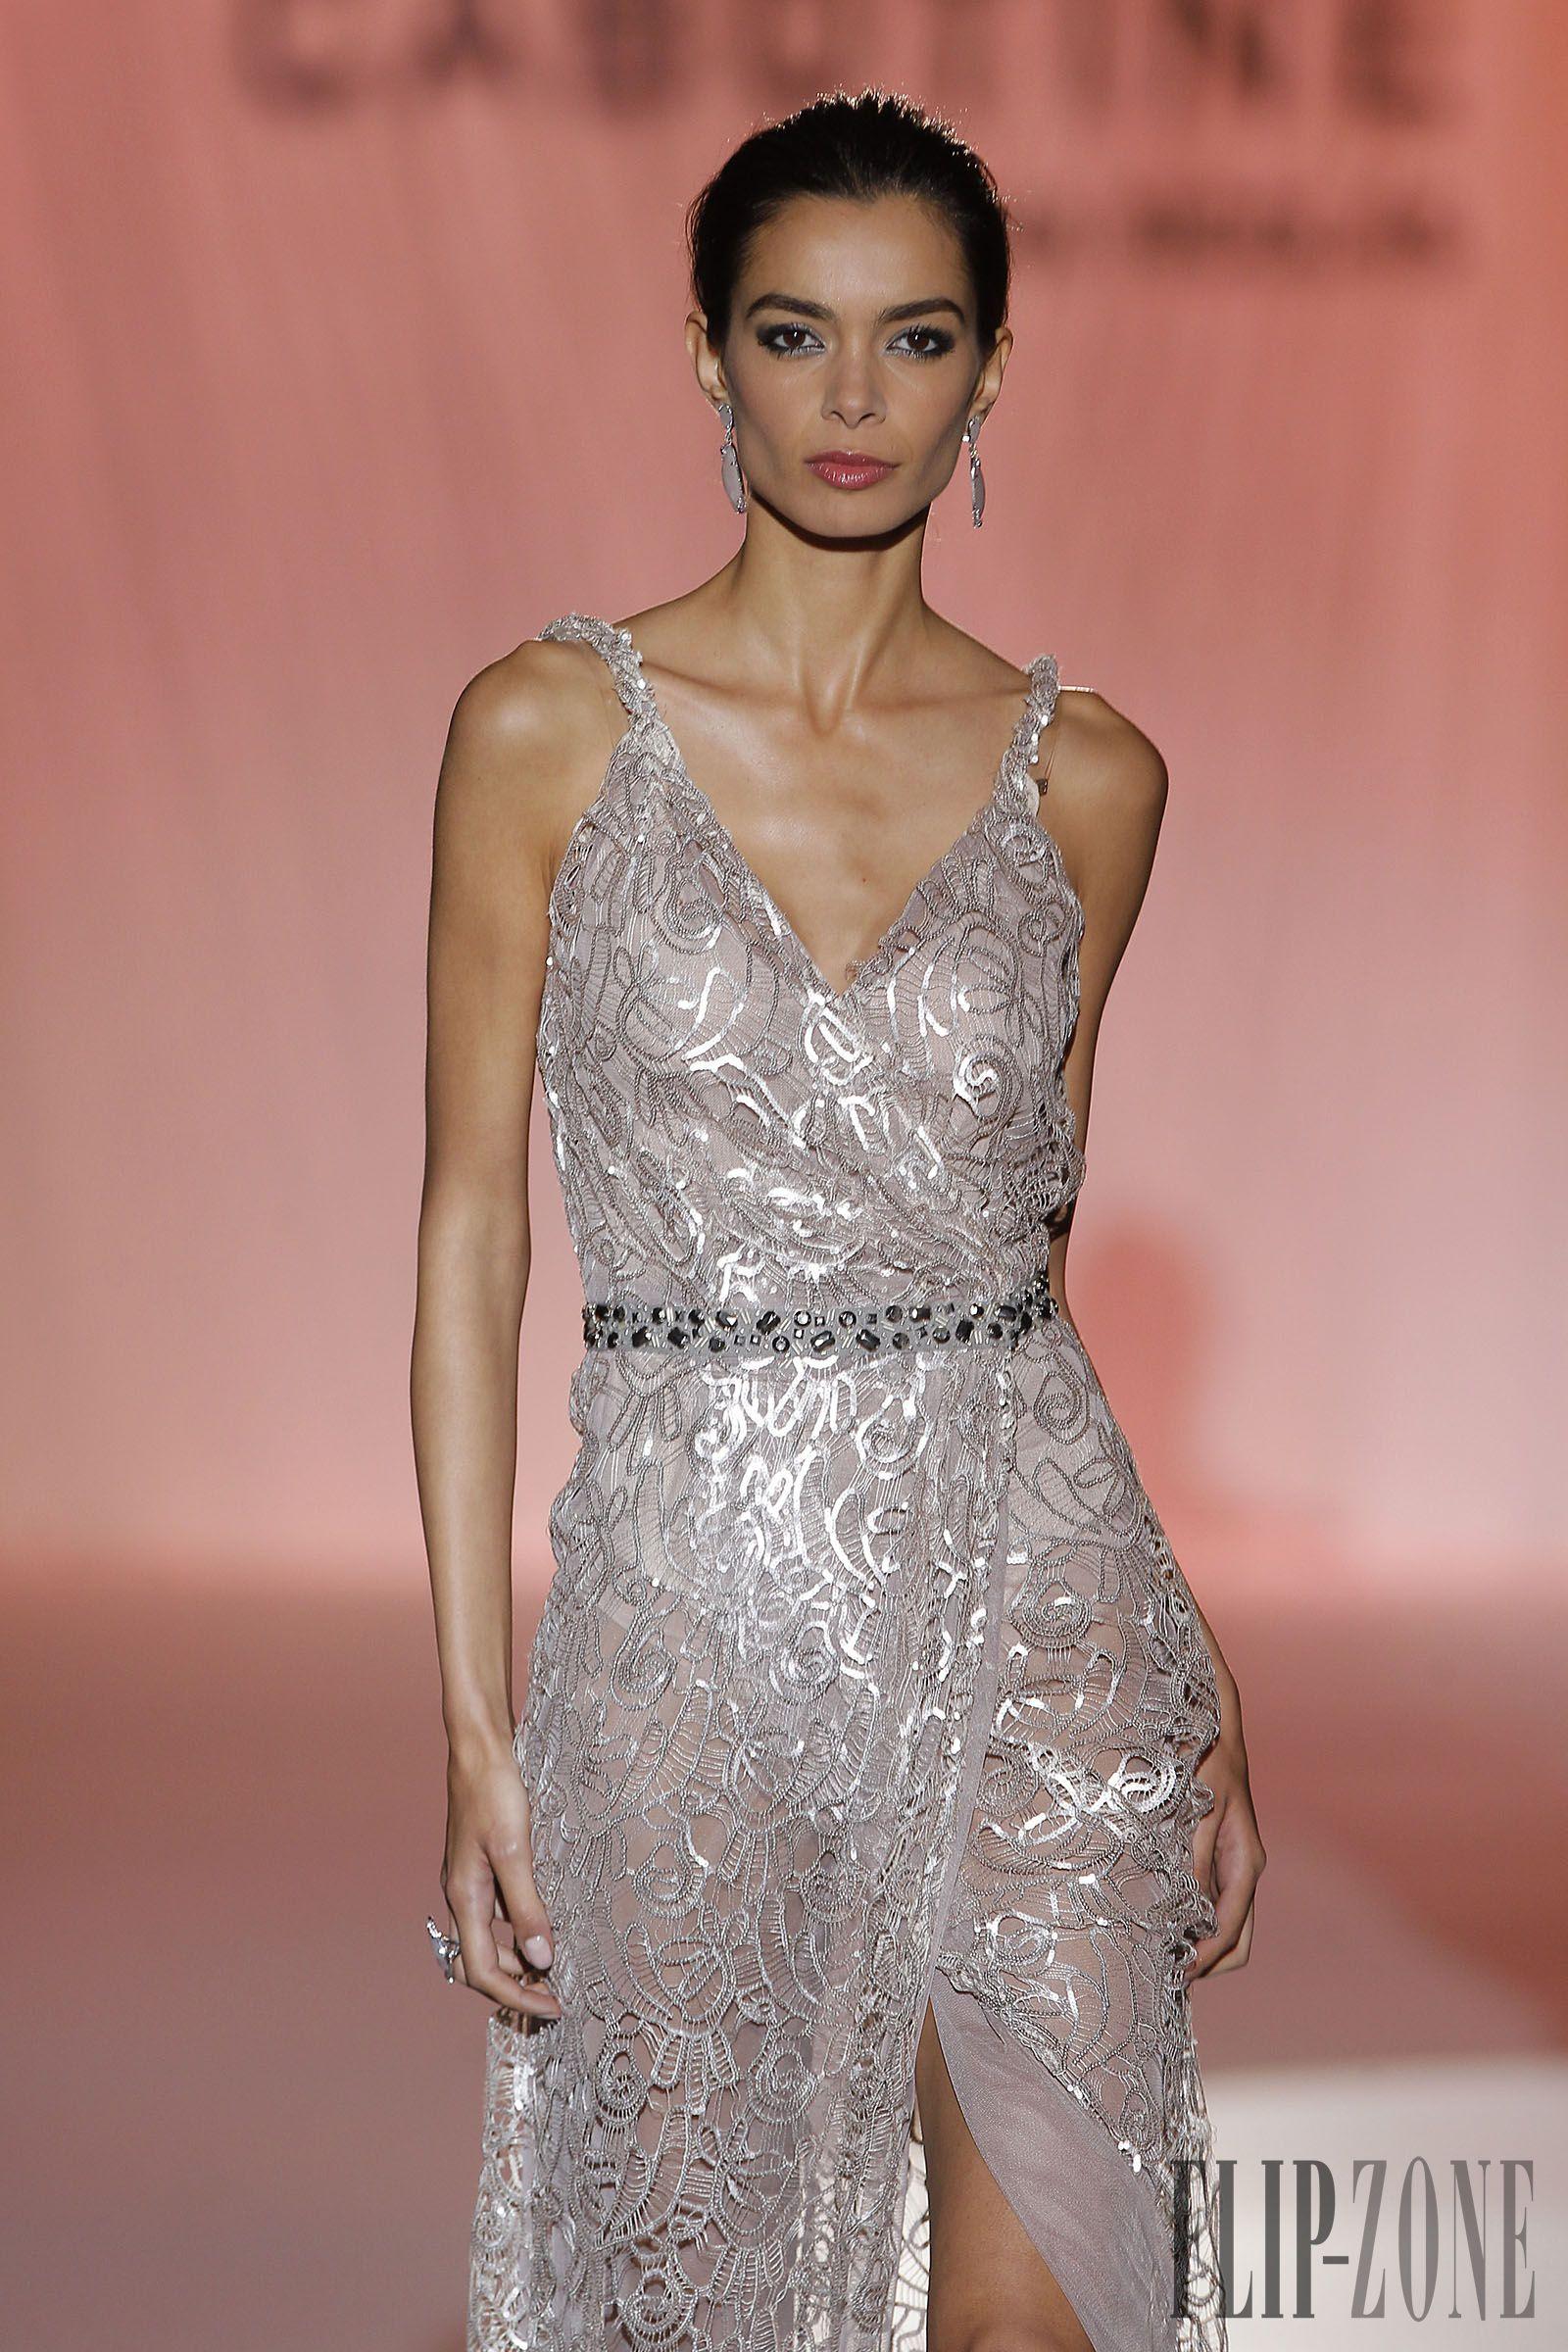 Cabotine 2015 collection - Bridal - http://www.flip-zone.net/fashion/bridal/the-bride/cabotine-4753